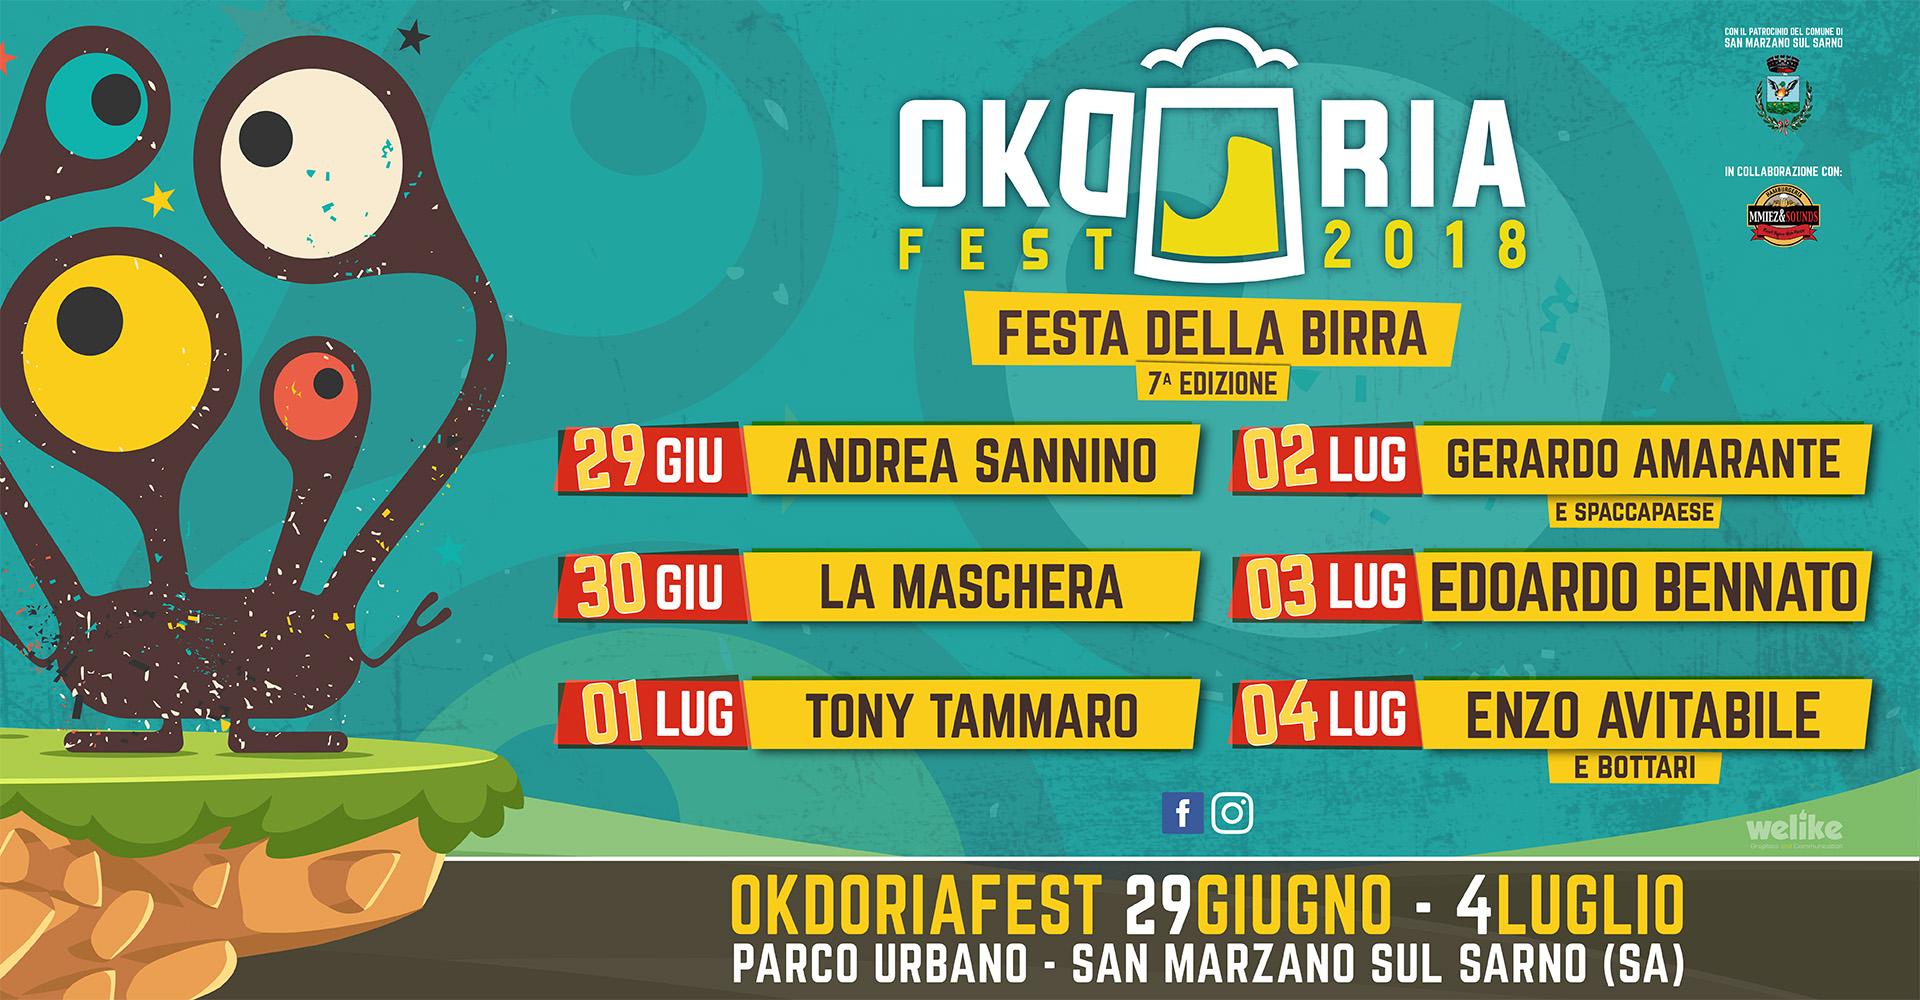 Okdoriafest2018 - Programma